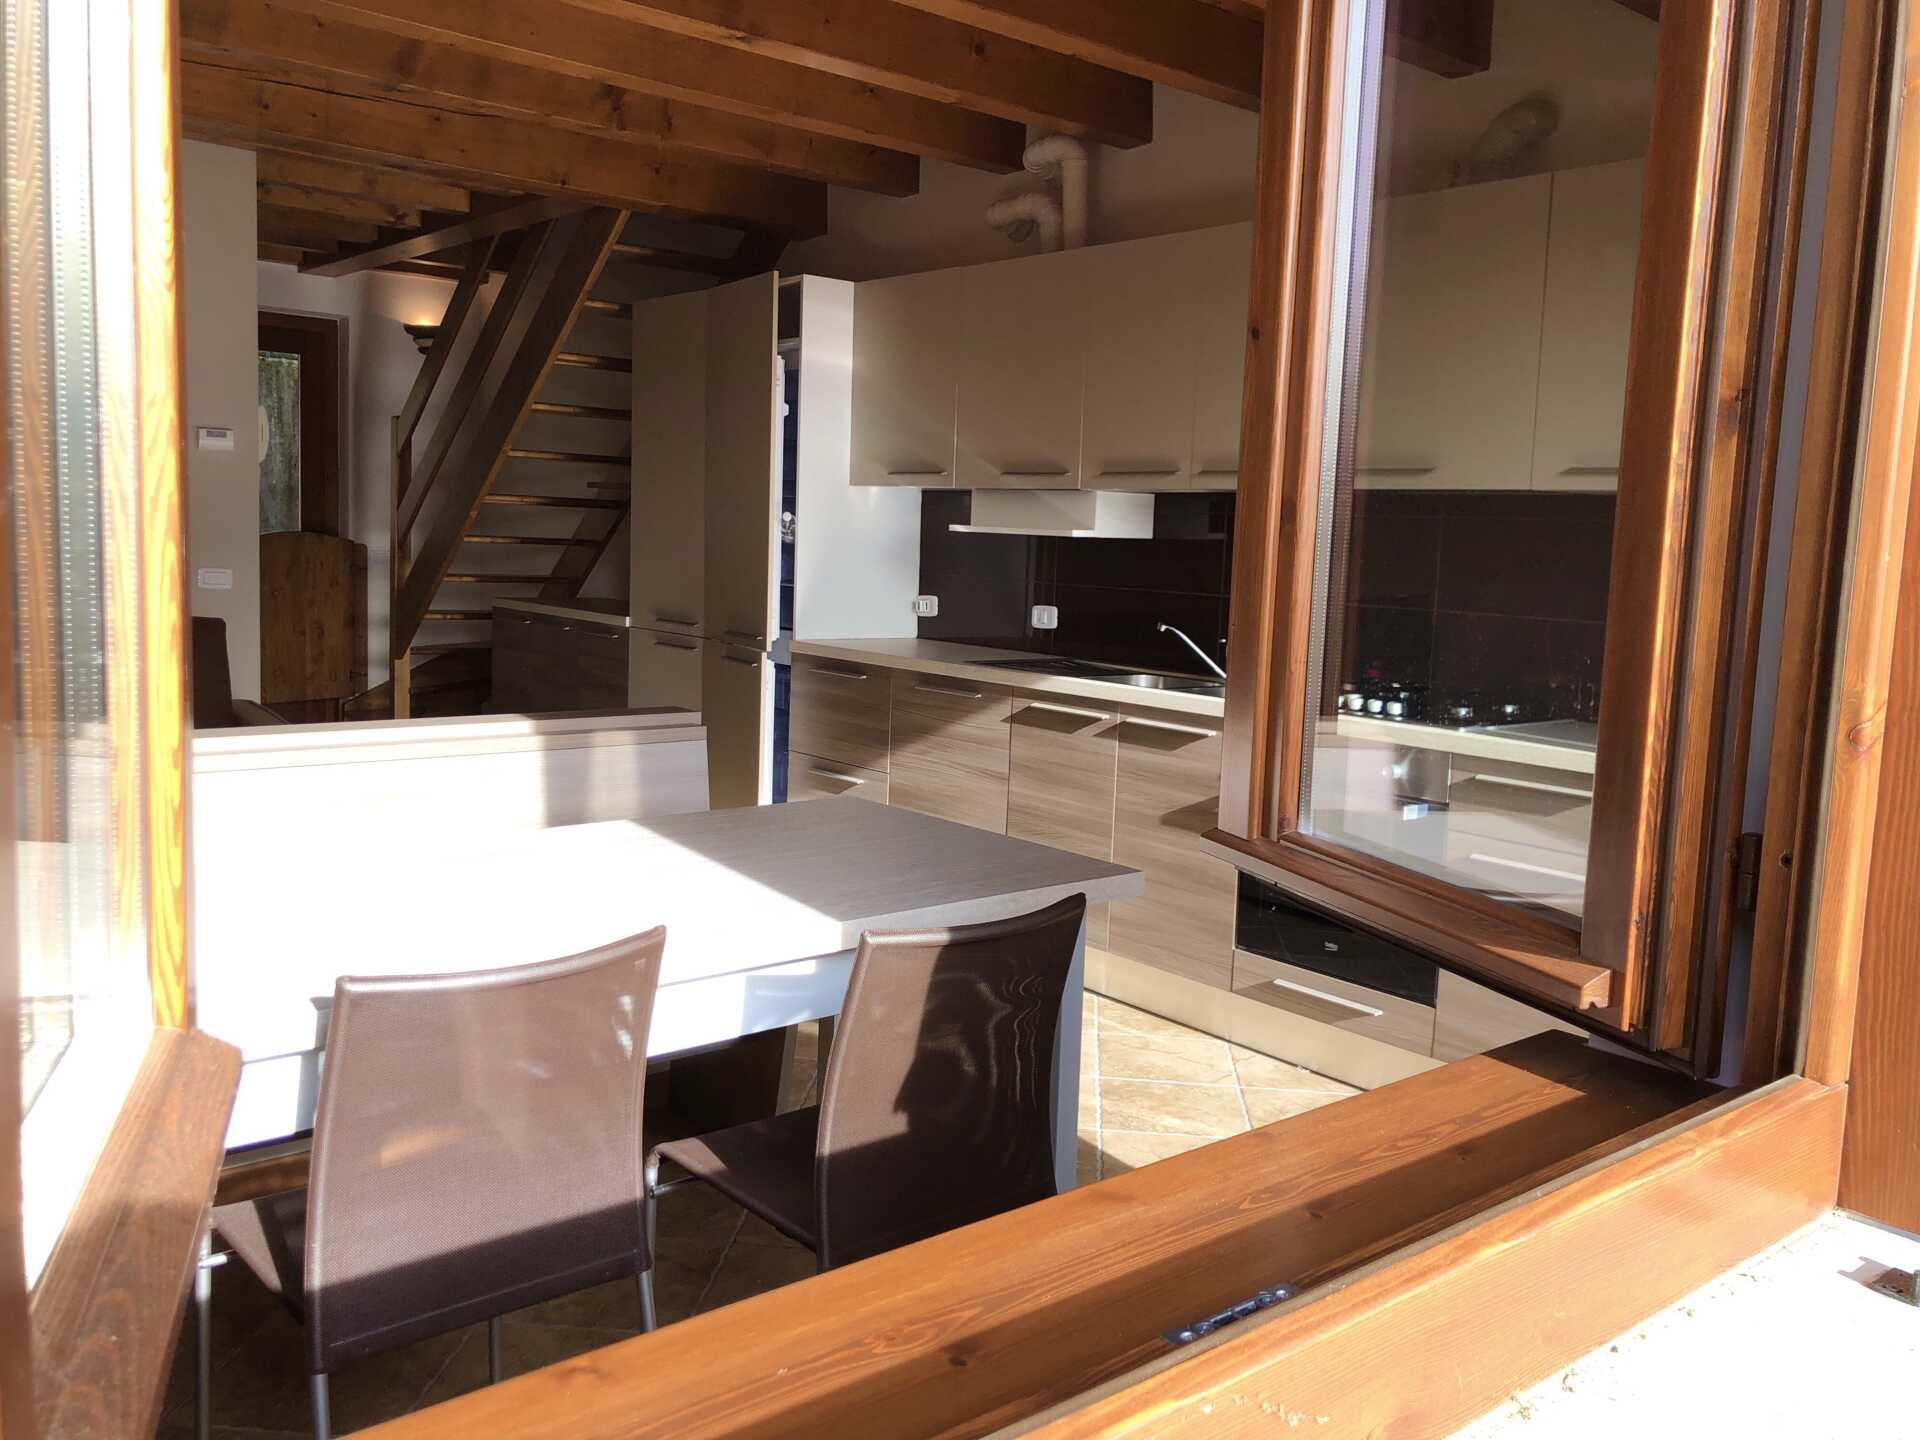 Casa-vacanze-in-vendita-appartamento-a-Dossena (12)